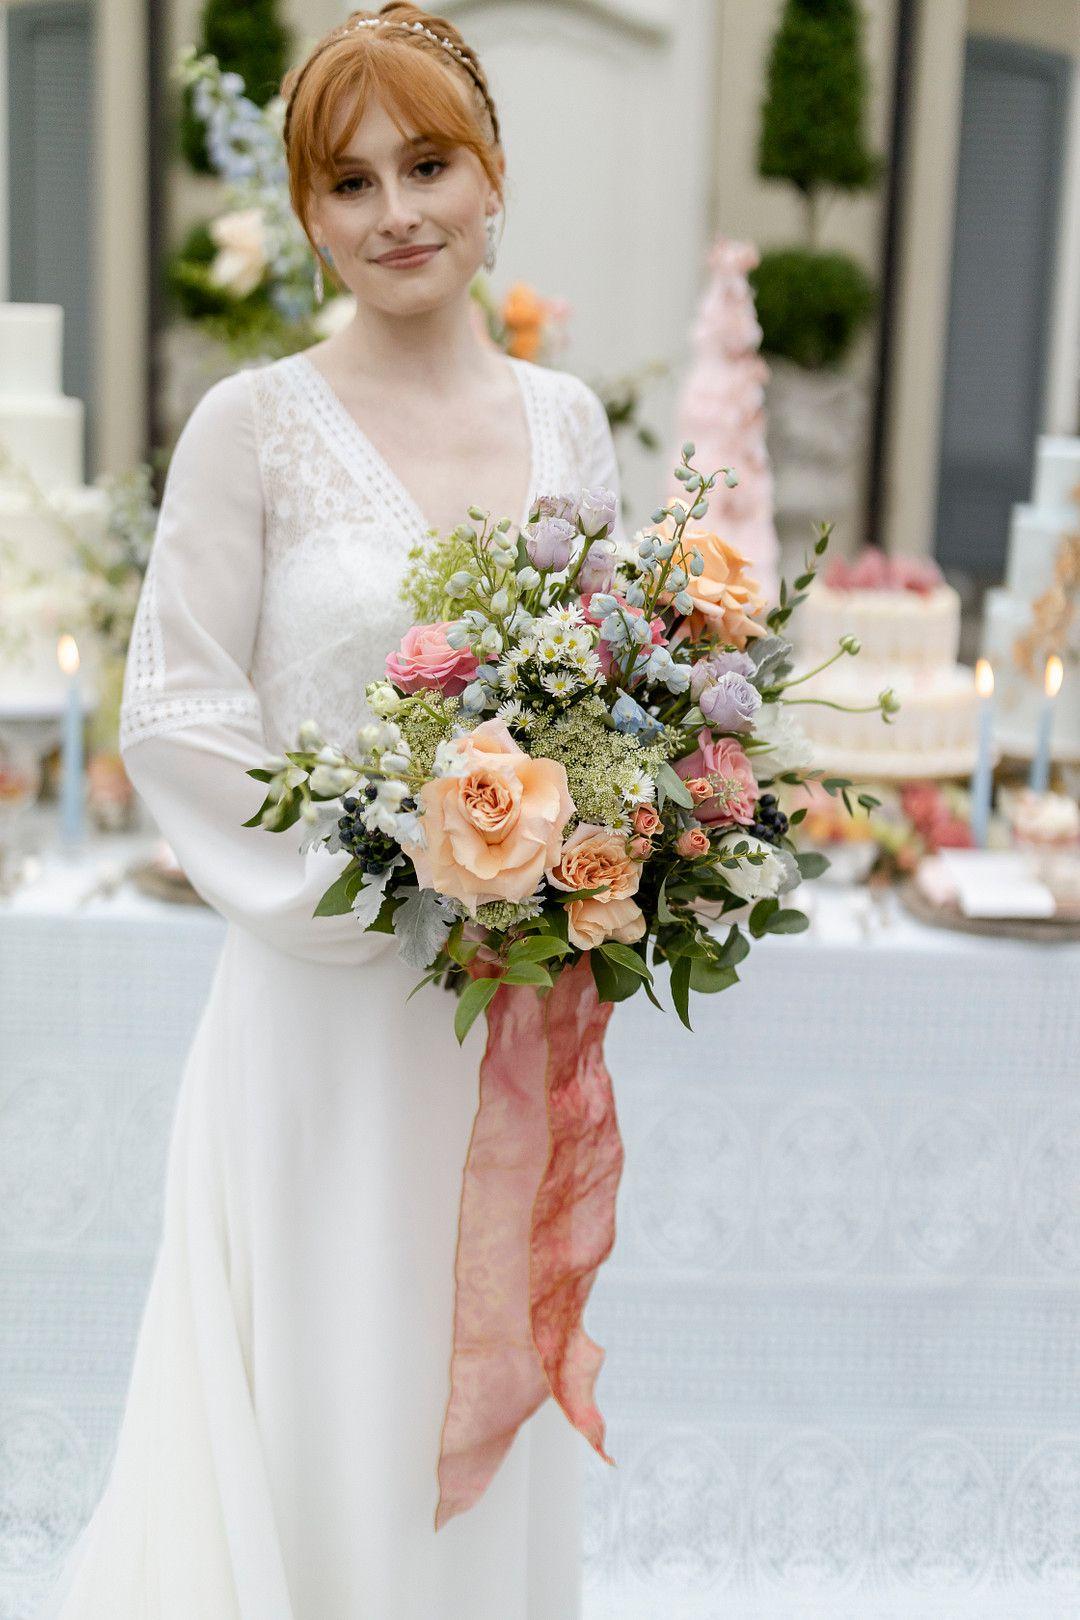 bridgerton netflix inspired bride